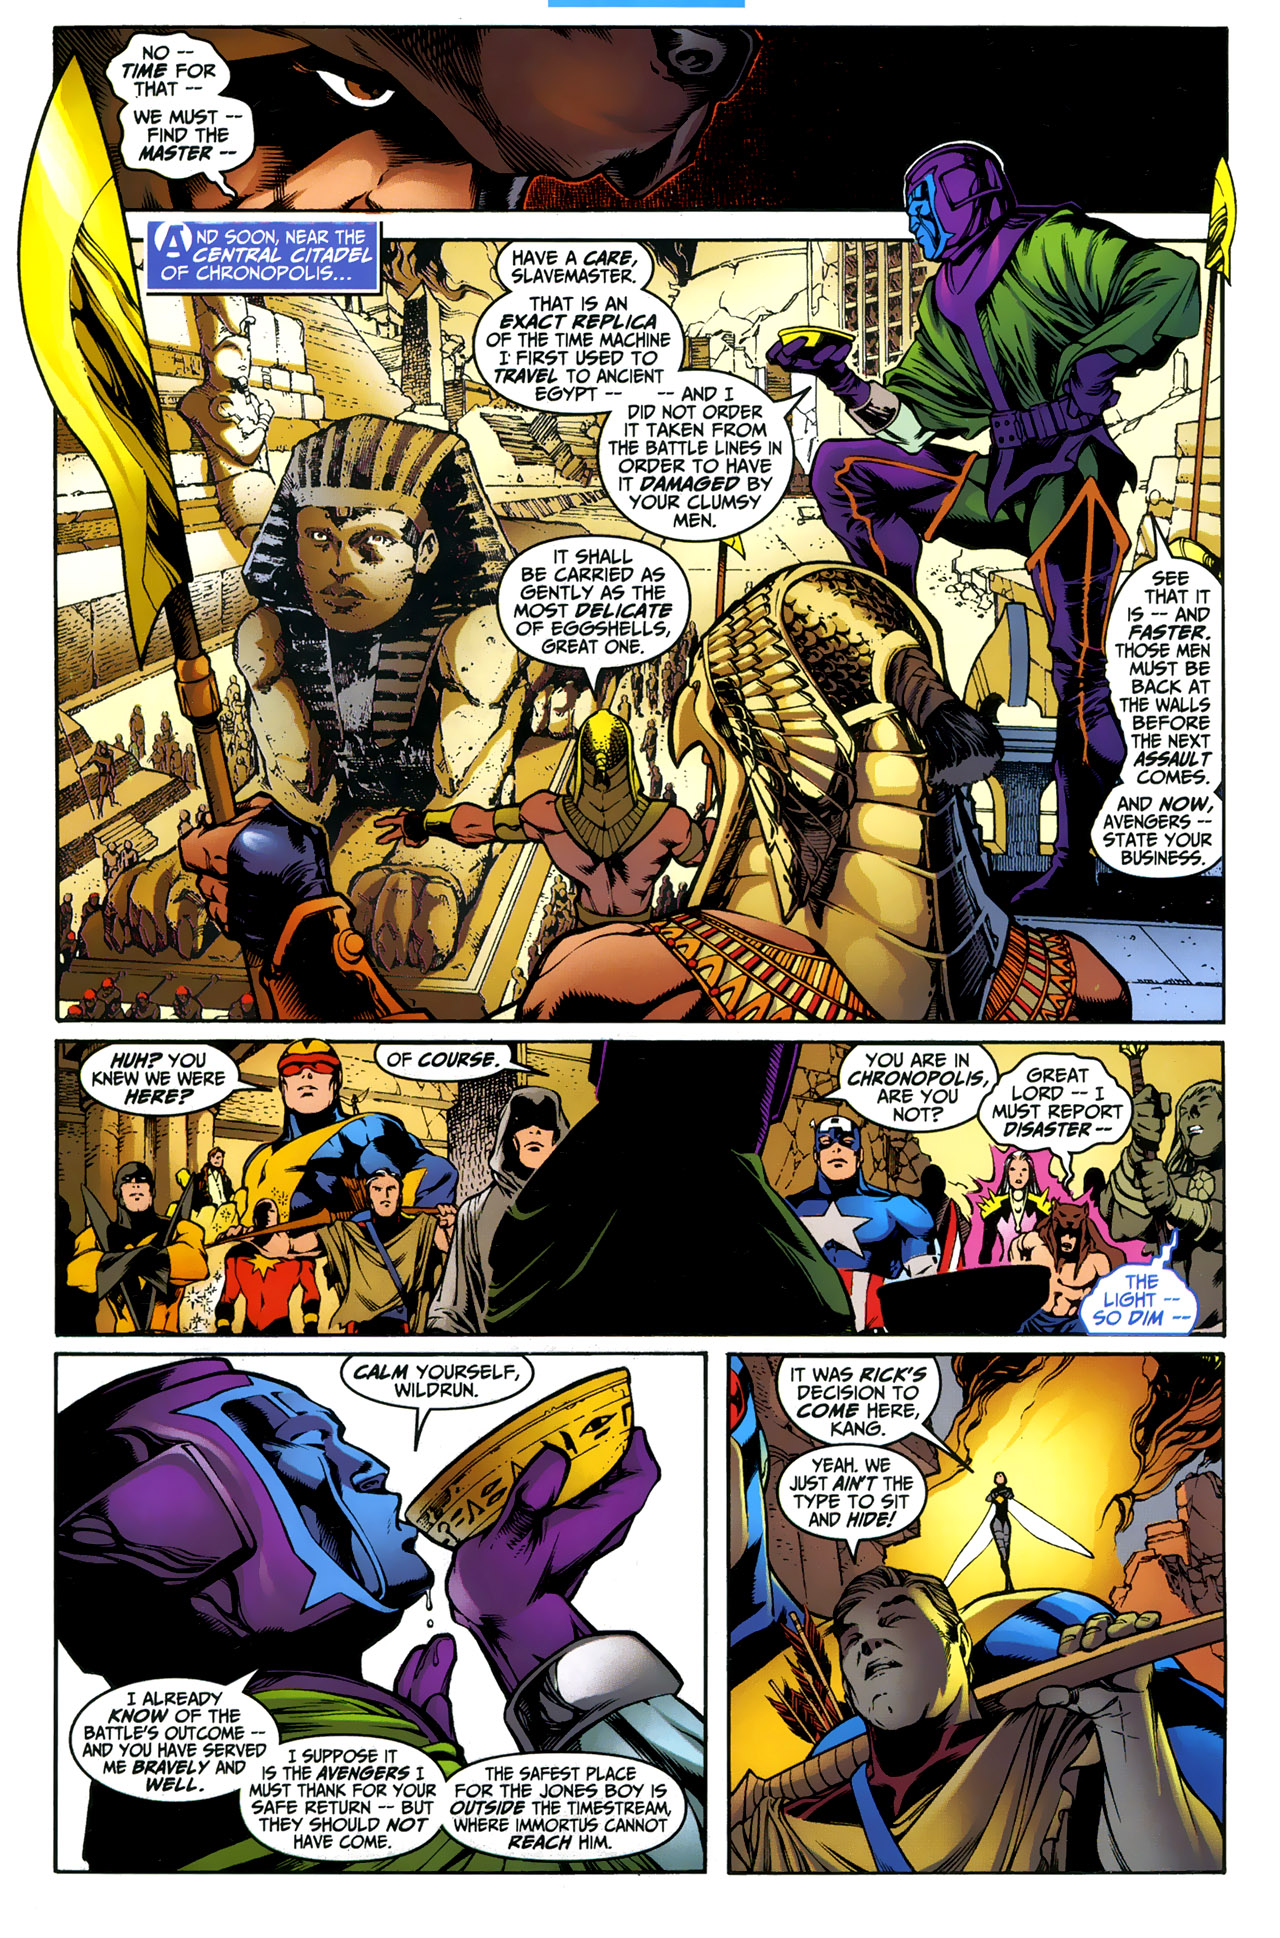 Avengers Forever Issue 3 | Viewcomic reading comics online